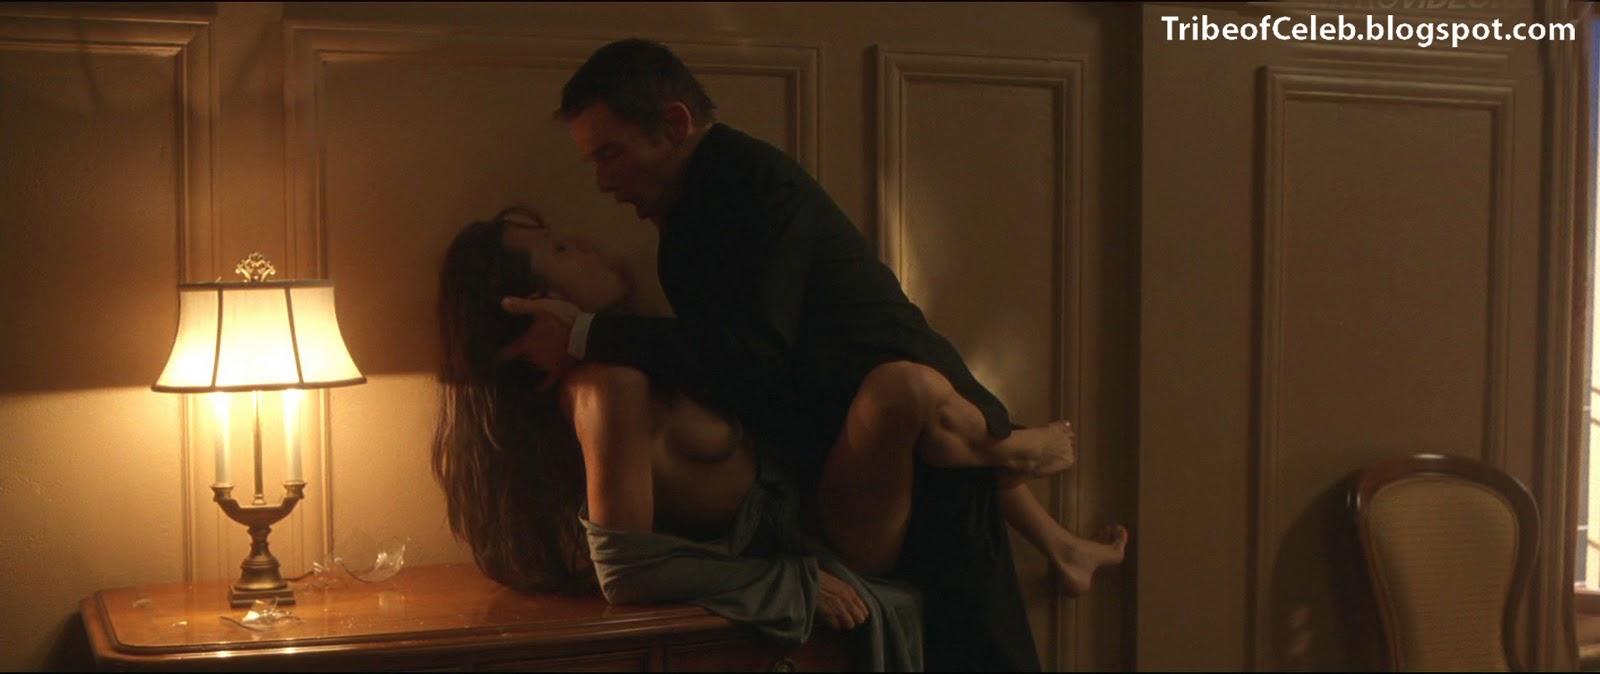 Angelina Jolie Porno Video angelina jolie sex scene taking lives opinion - xxx com hot porn